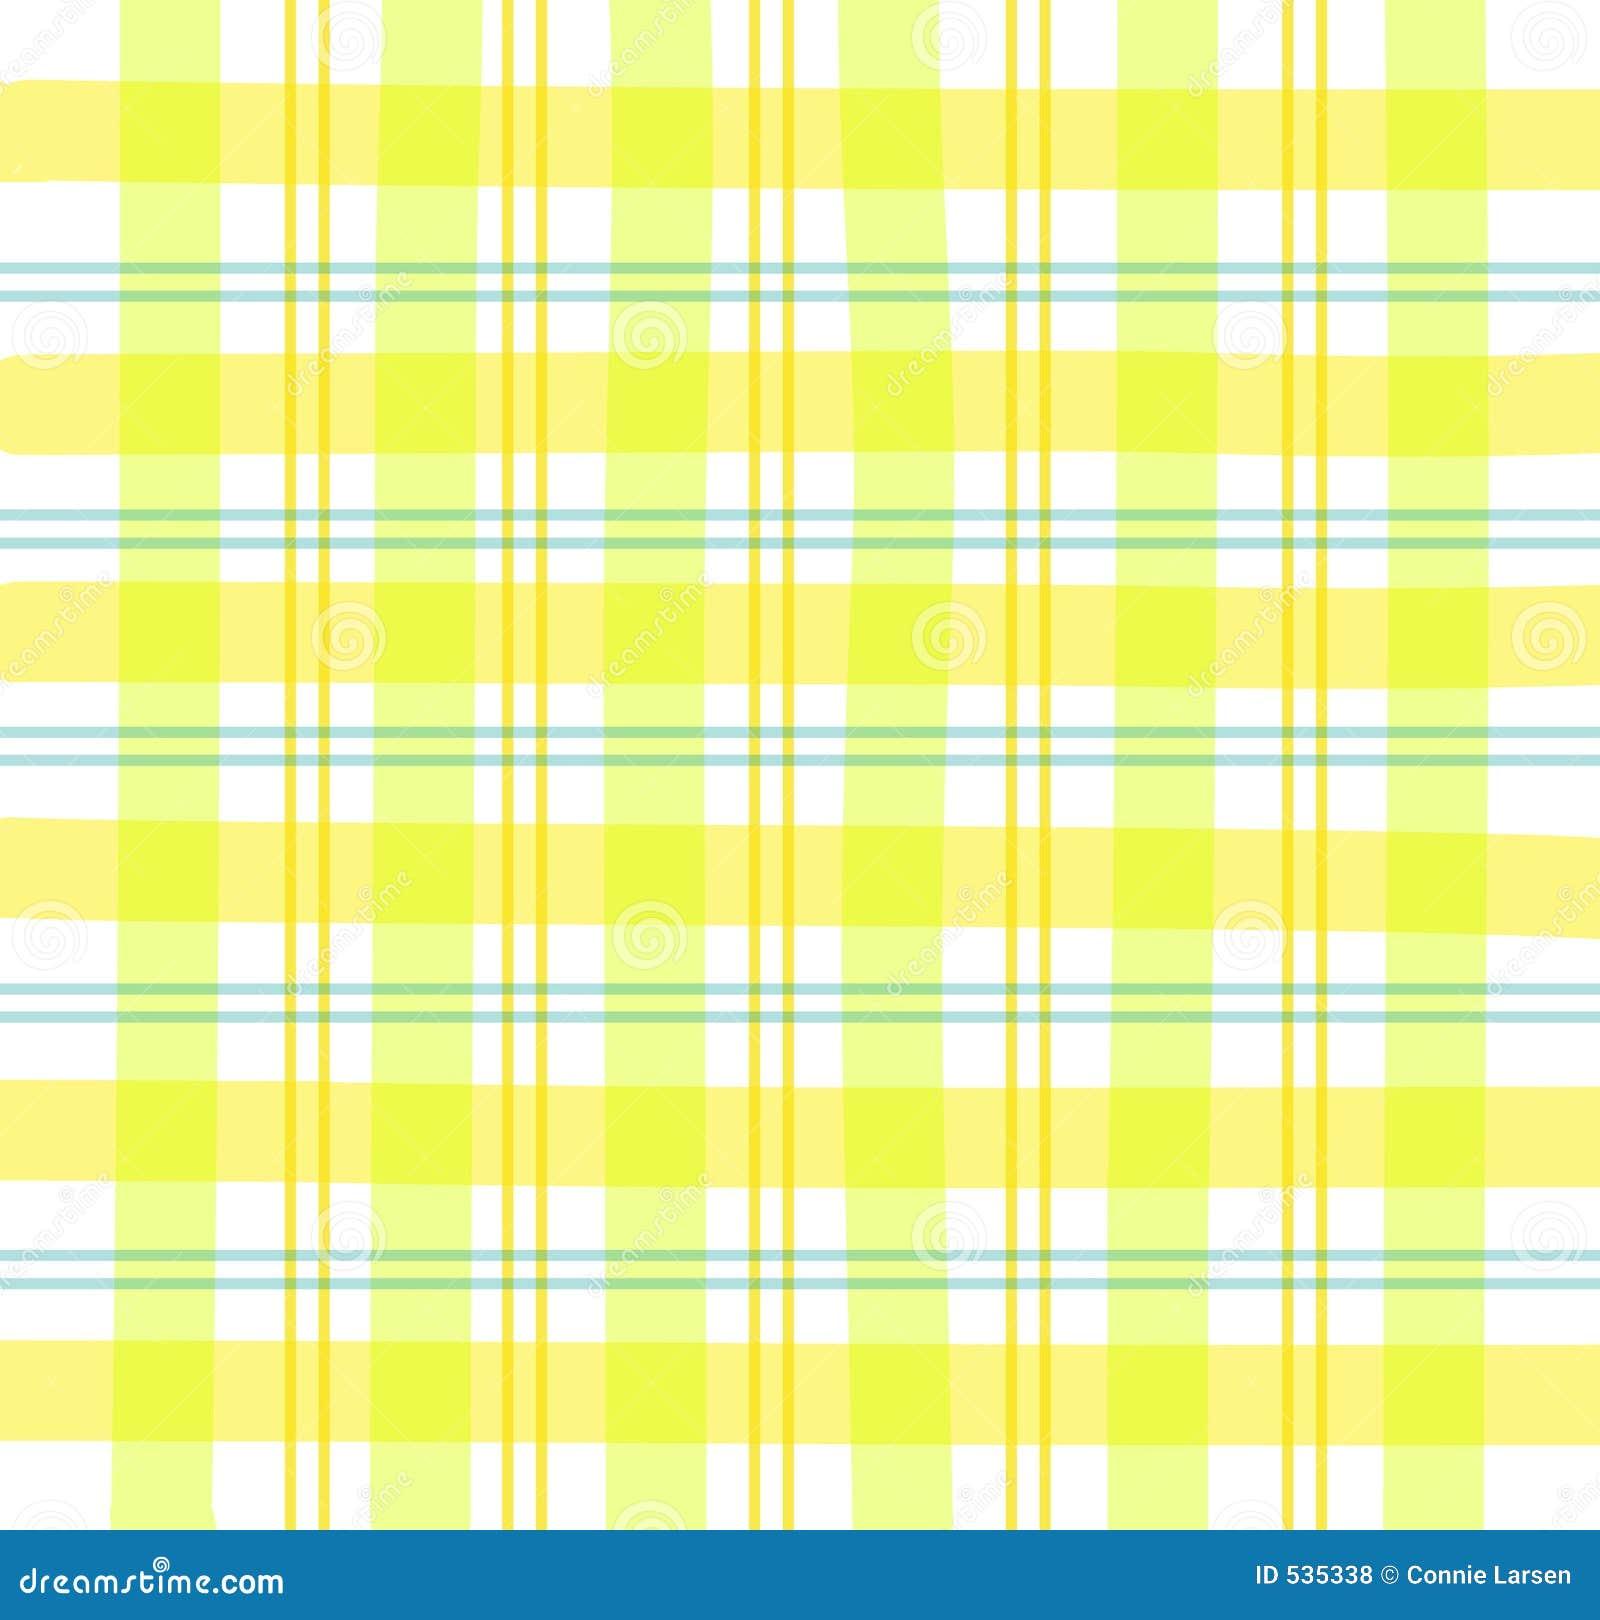 Download 方格花布格子花呢披肩黄色 库存例证. 插画 包括有 装饰, 乐趣, 纹理, 背包, 夏天, 织品, 方格花布 - 535338